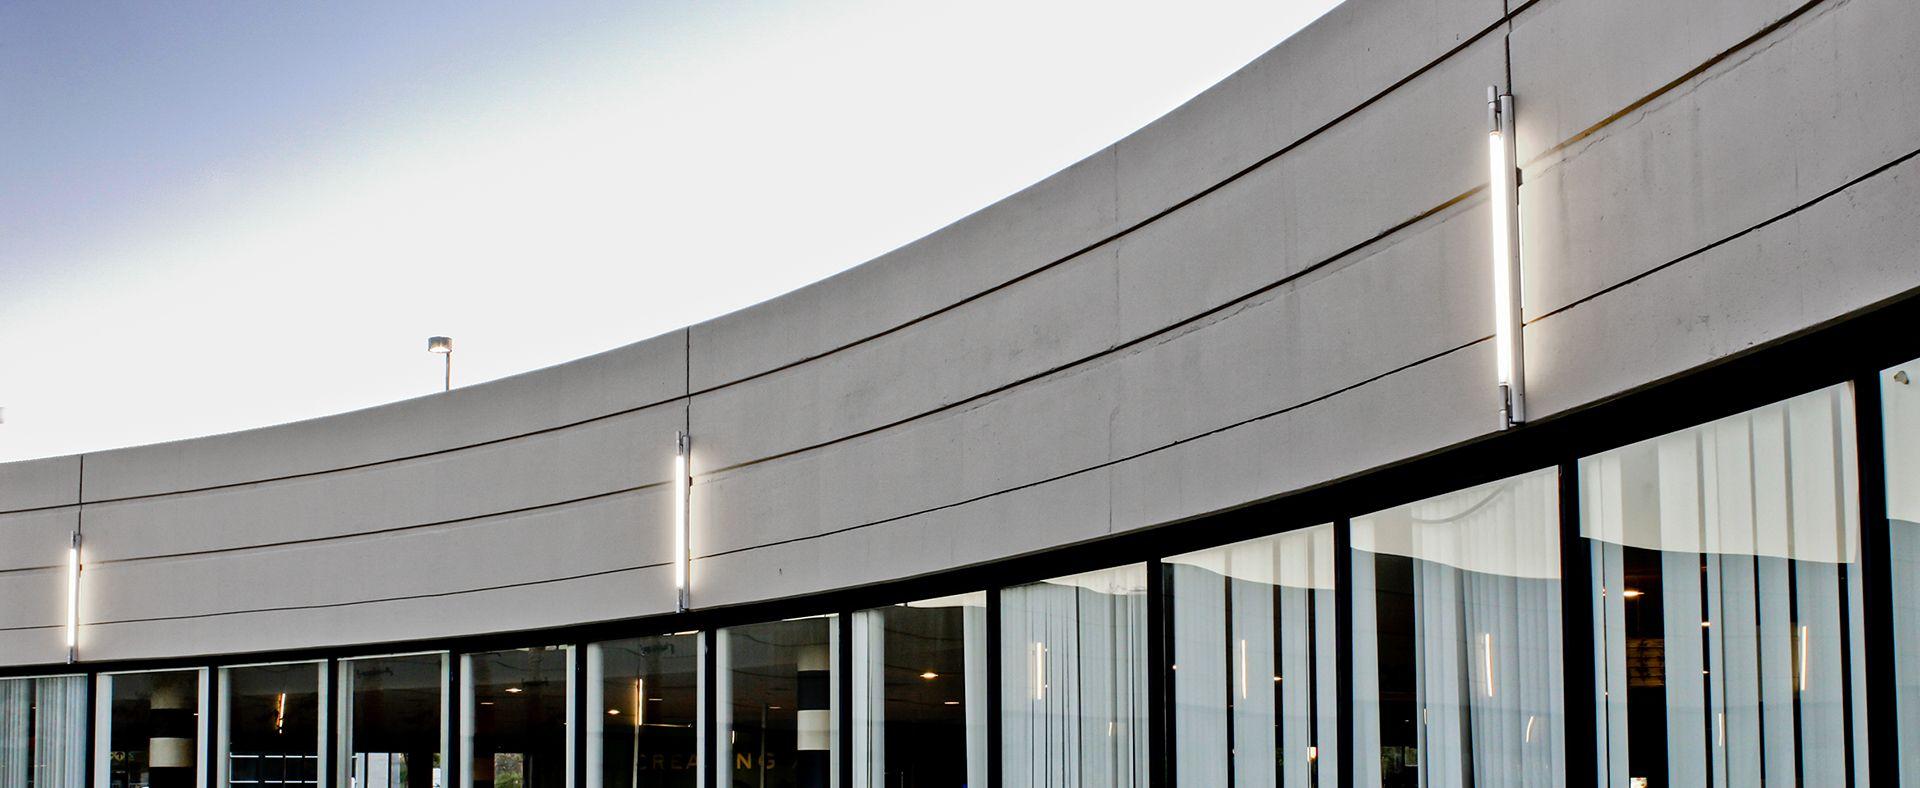 Brace Exterior Linear Fixture SPI Lighting | Exterior ...